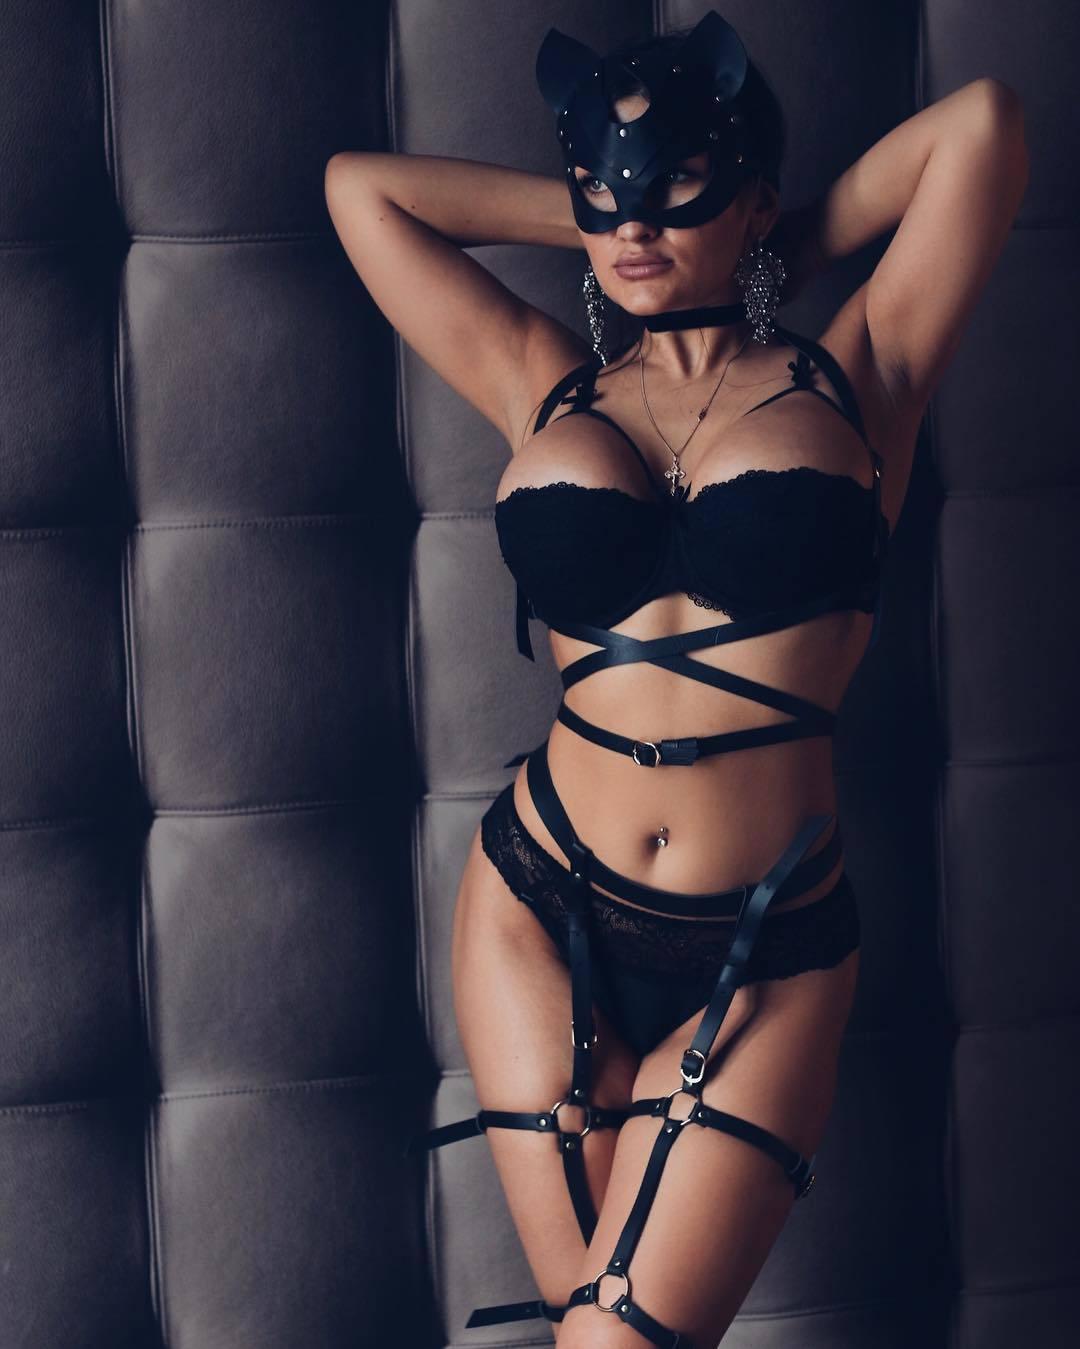 Olga Seteykina – Beautiful Body In Sexy Instagram Pics 0040